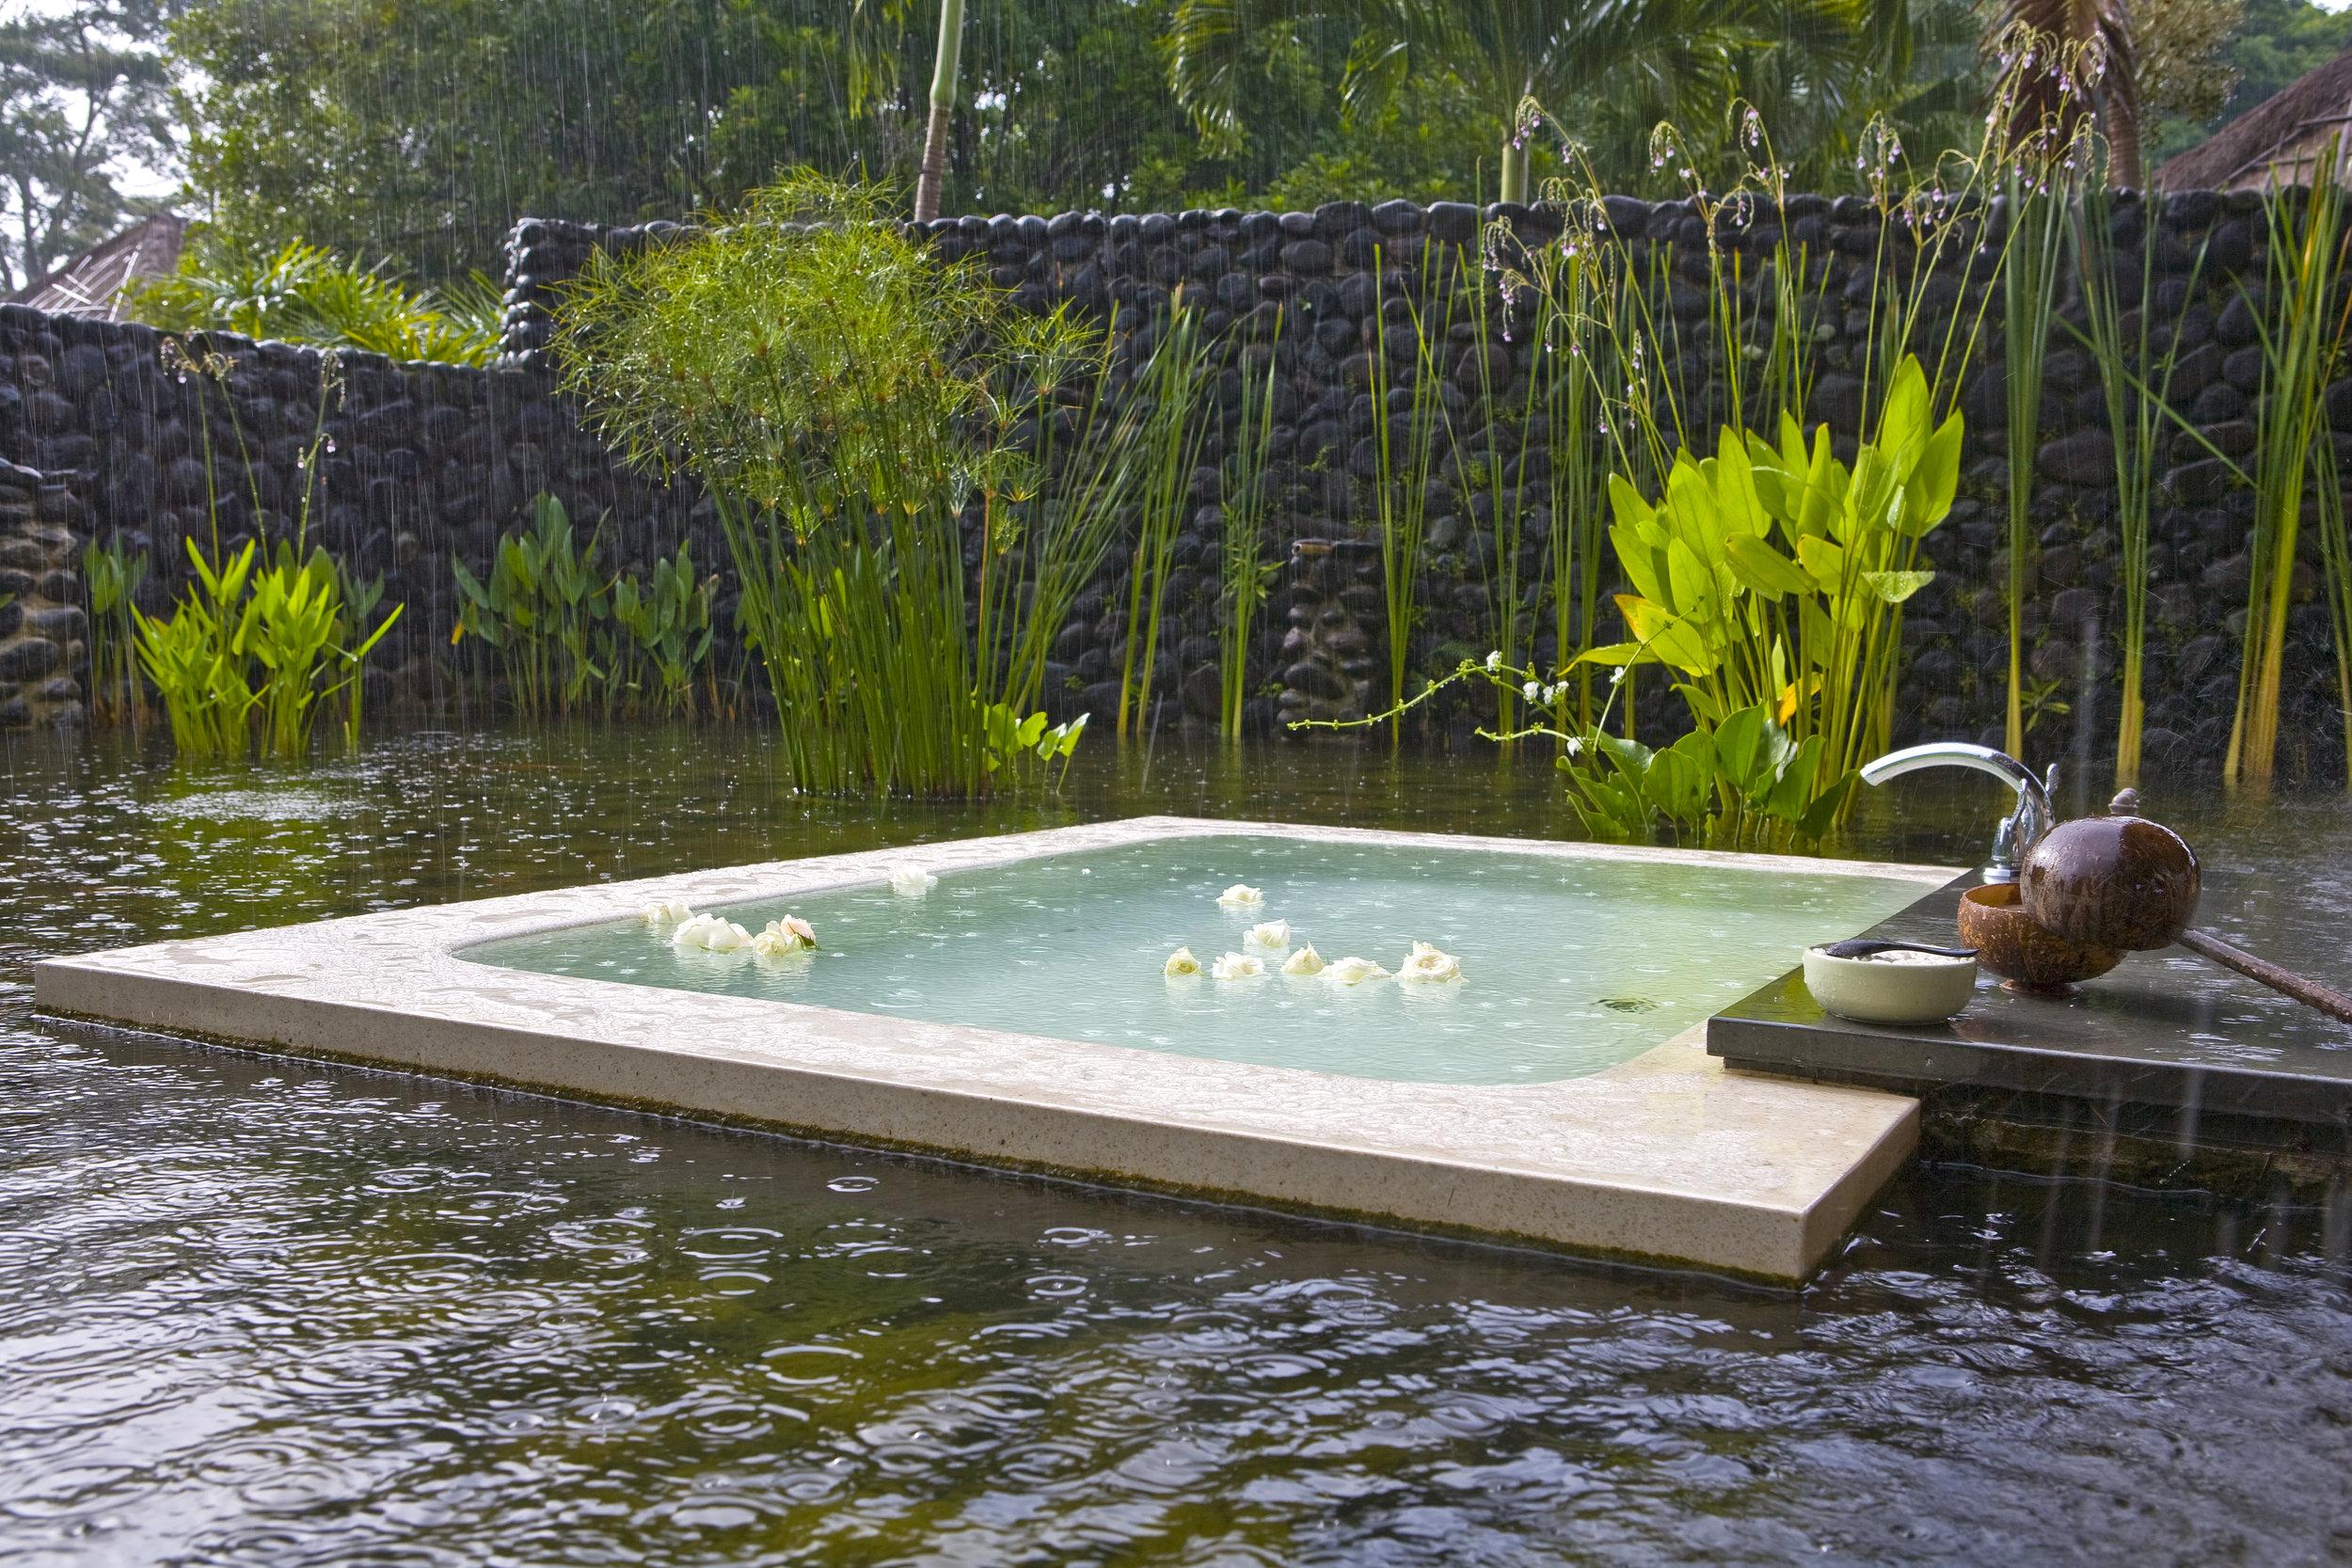 Alila Ubud - Accommodation - Pool Villa - Bathtub.jpg